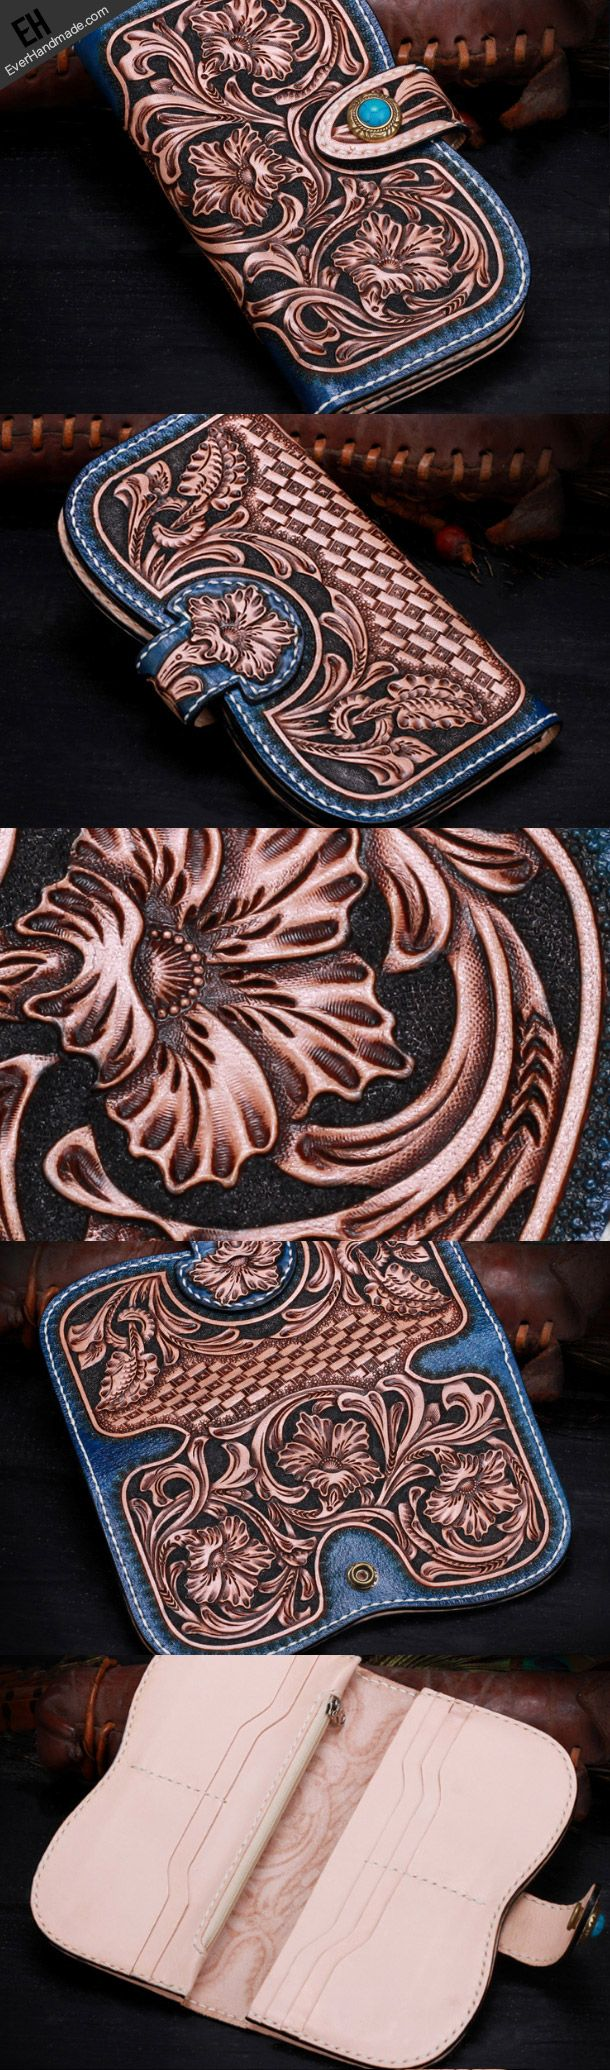 Handmade leather Blue Floral women wallet leather men clutch